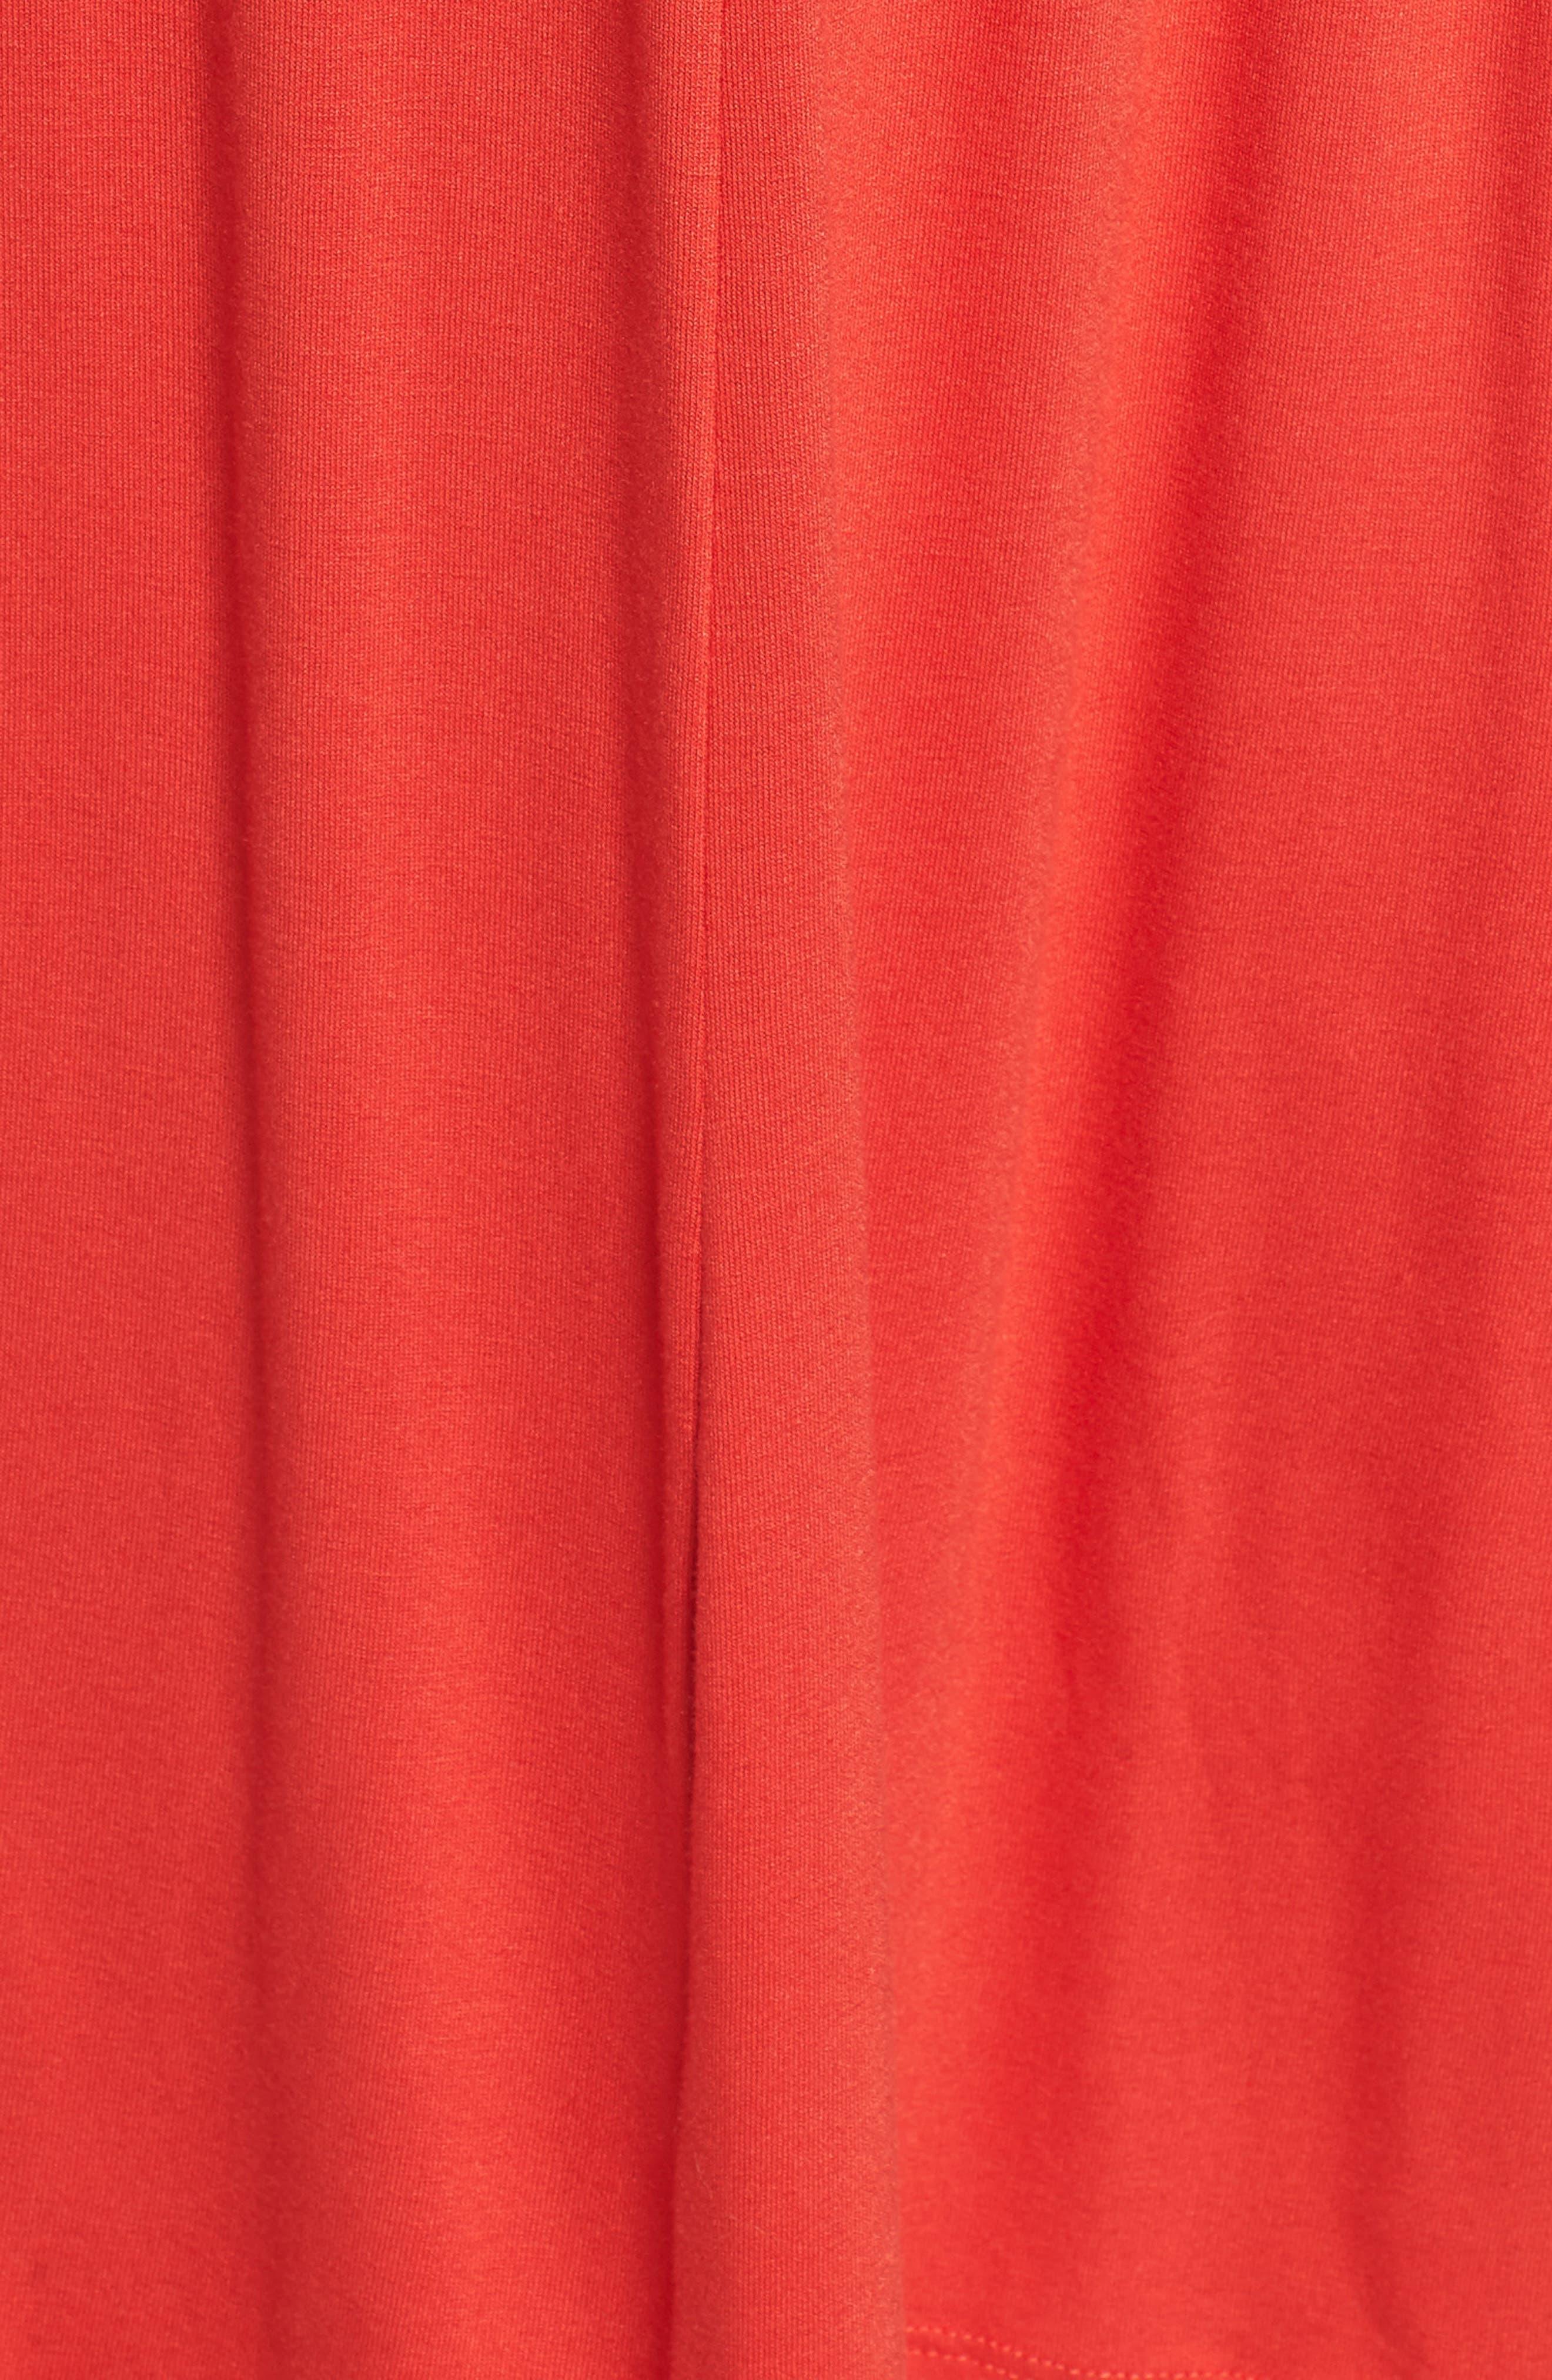 Jersey A-Line Dress,                             Alternate thumbnail 6, color,                             950